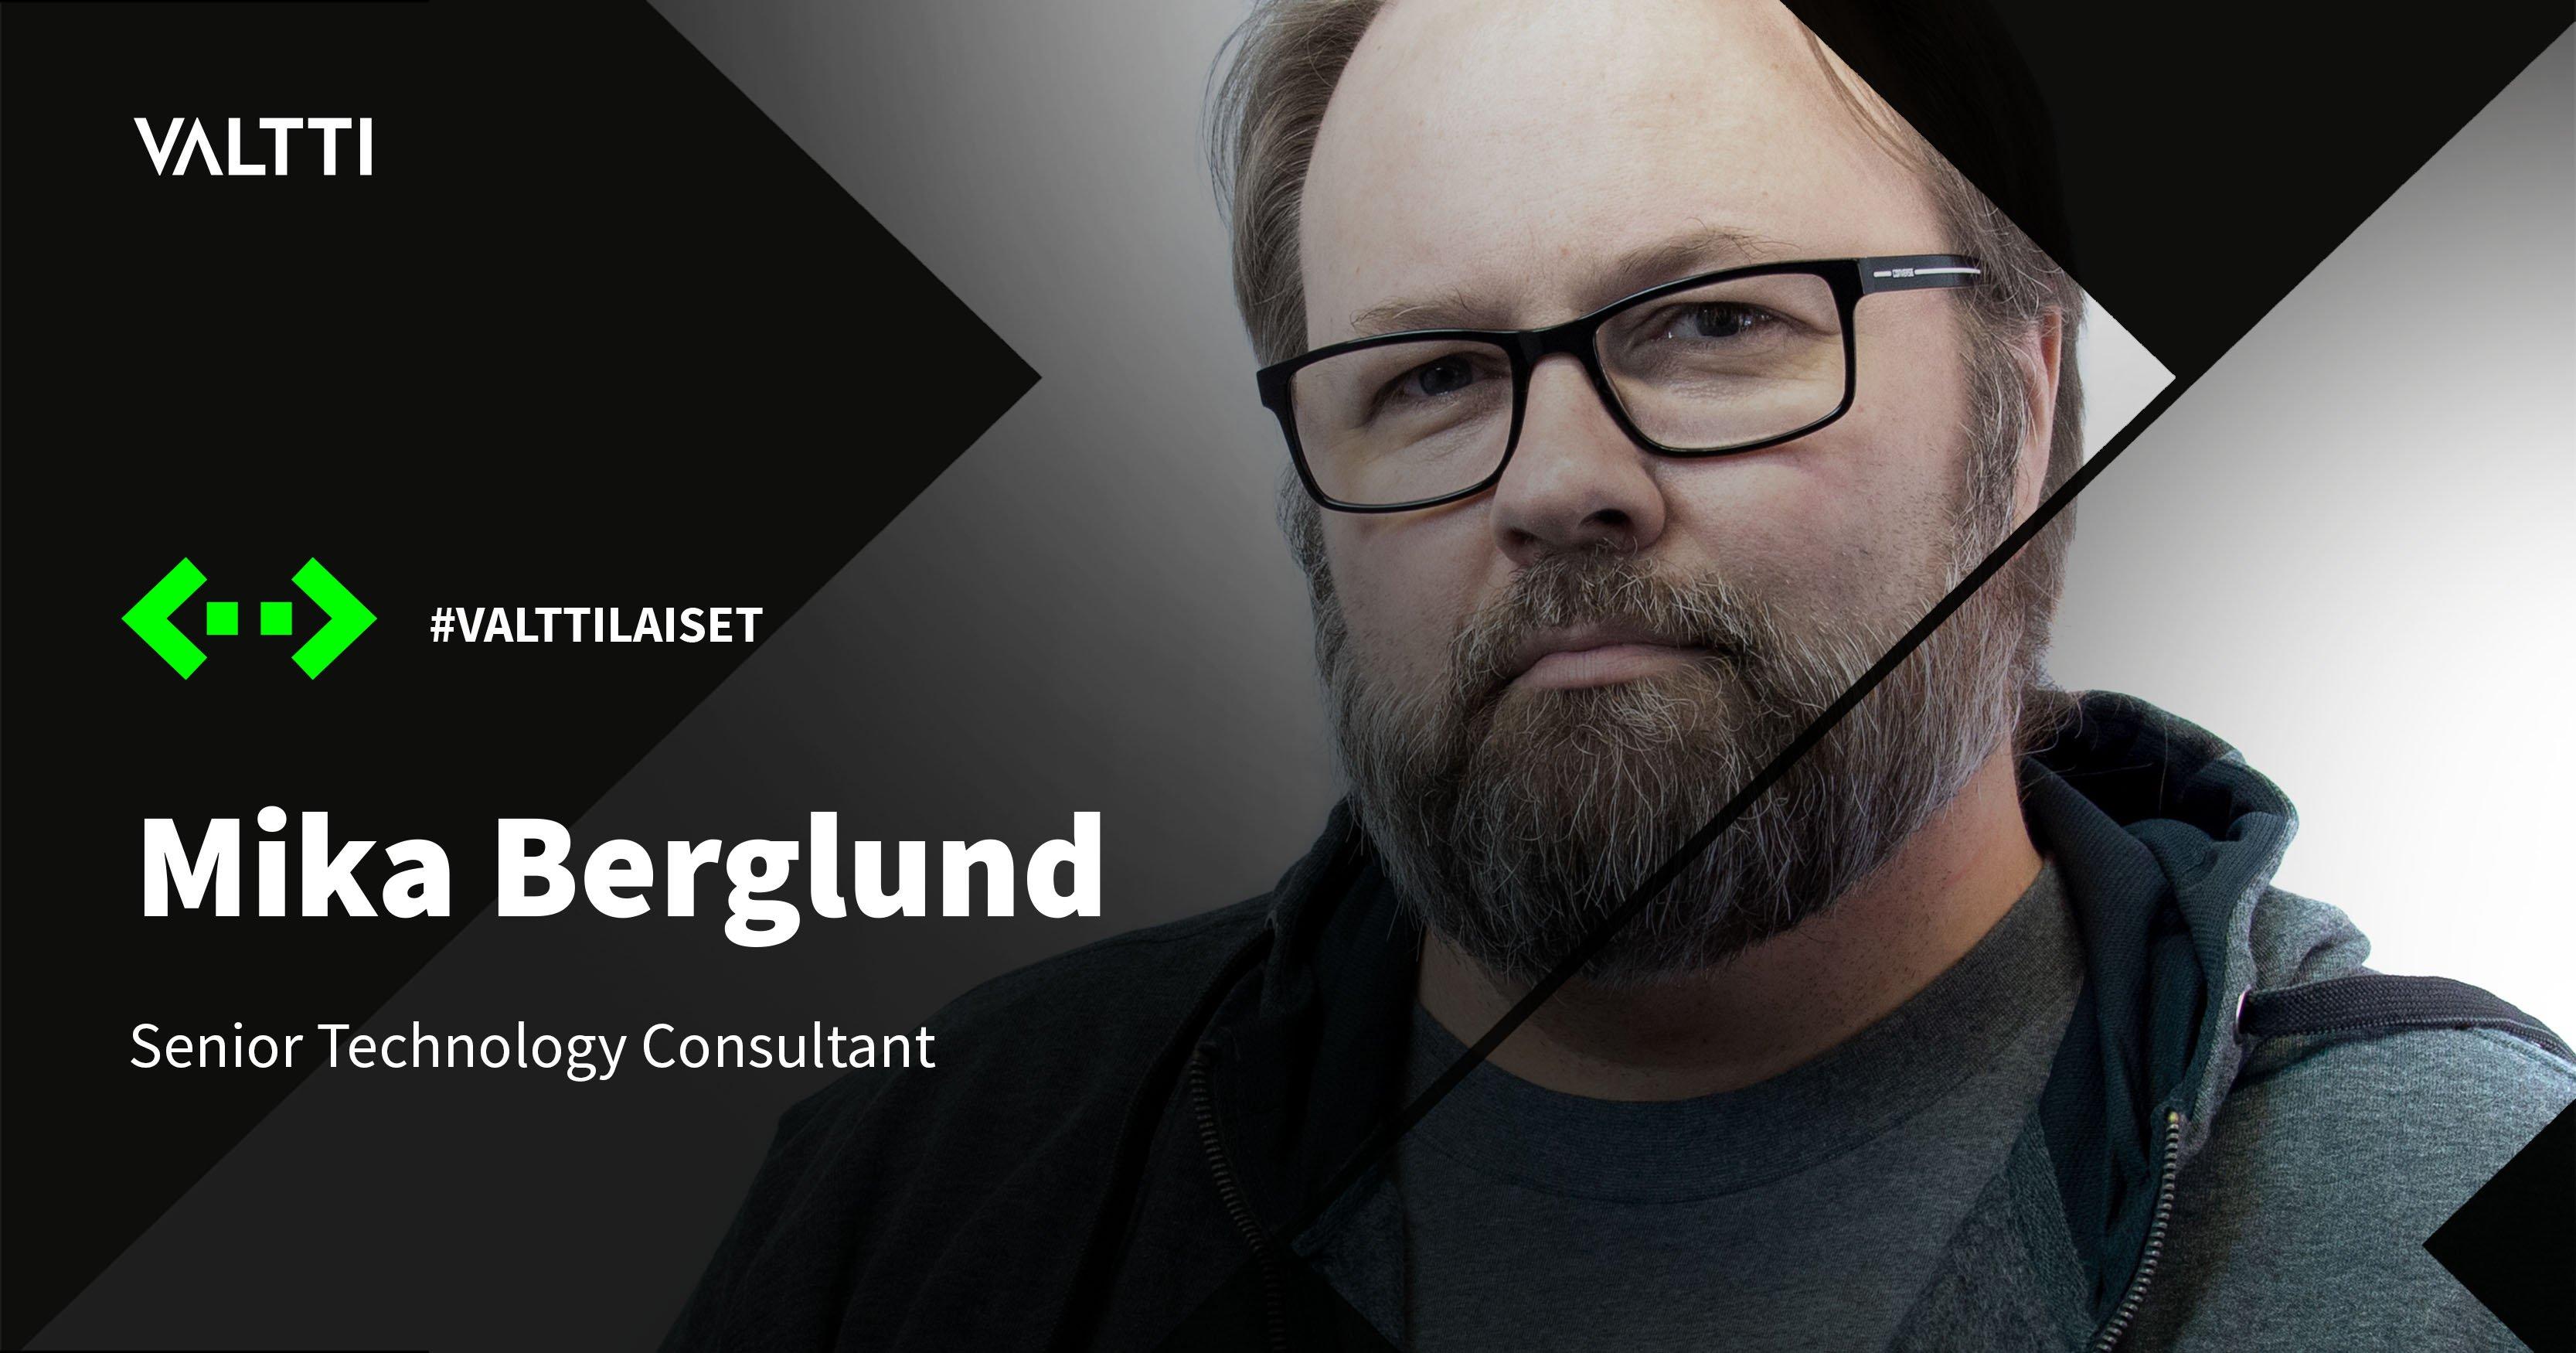 Mika-Berglund-Valttilaiset